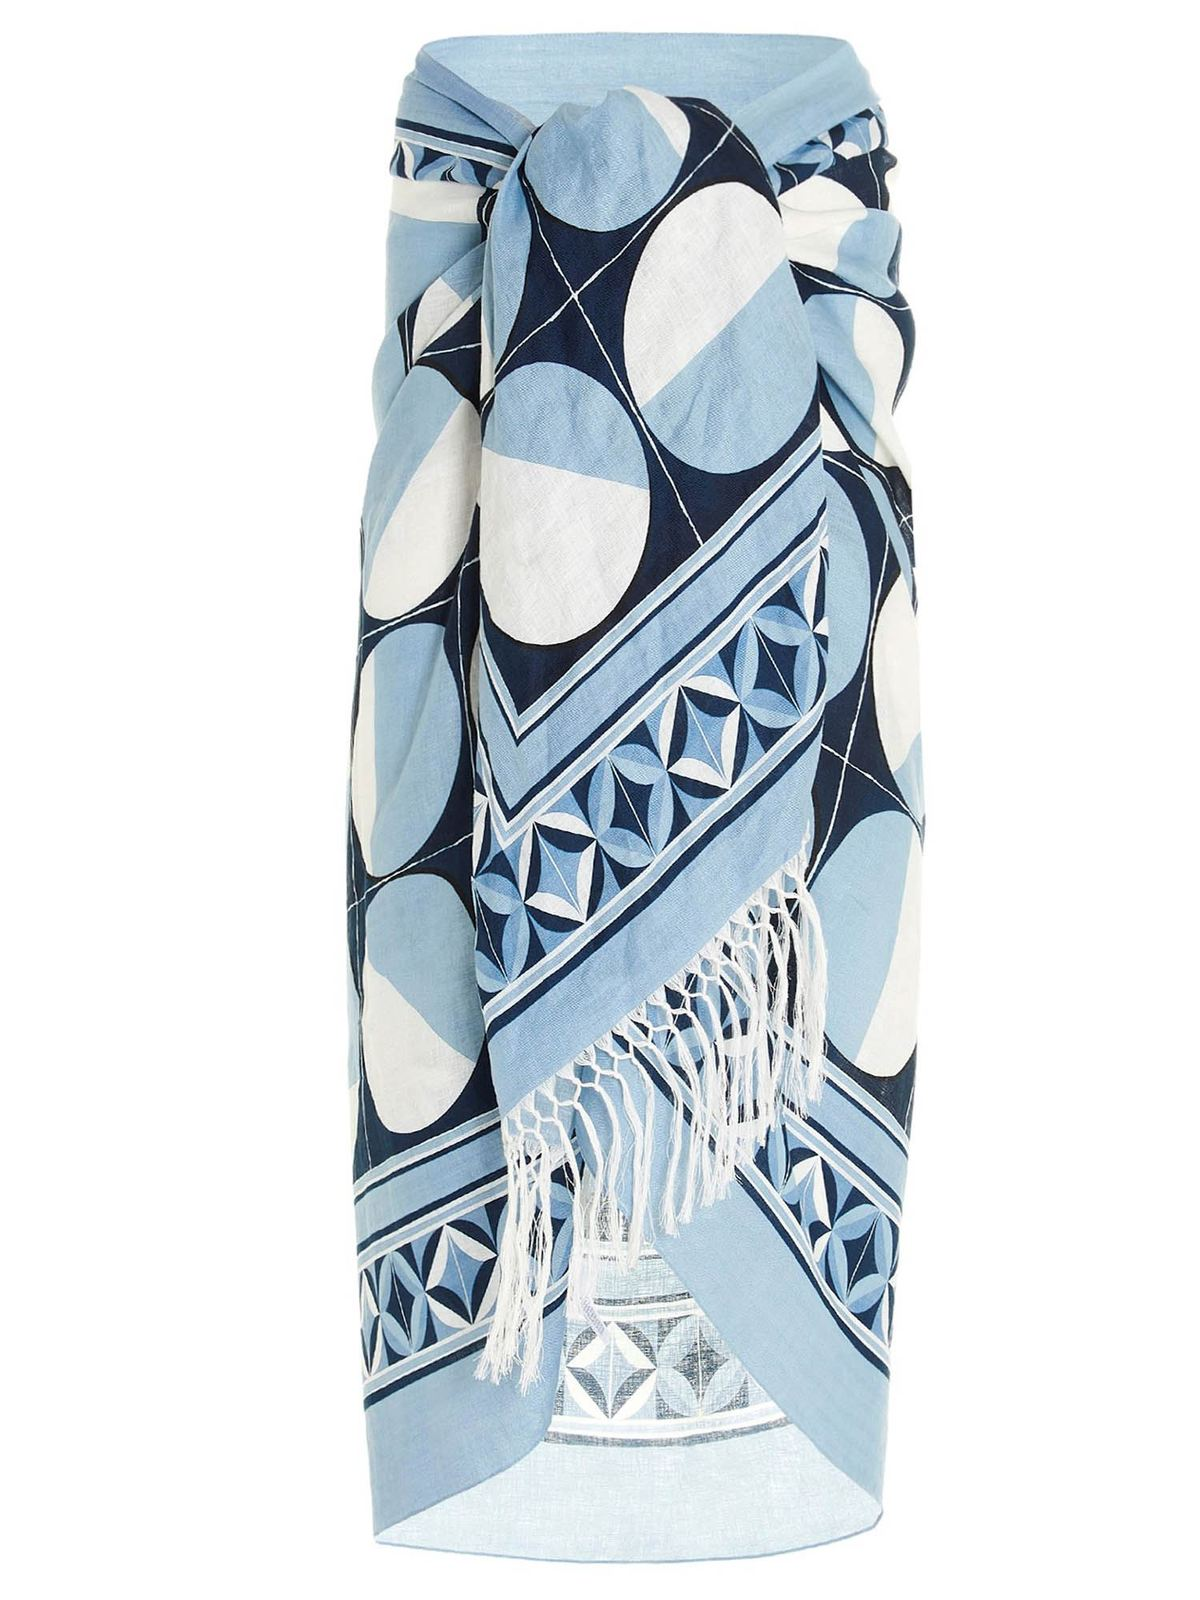 Dolce & Gabbana Majolica Print Beach Towel In Light Blue